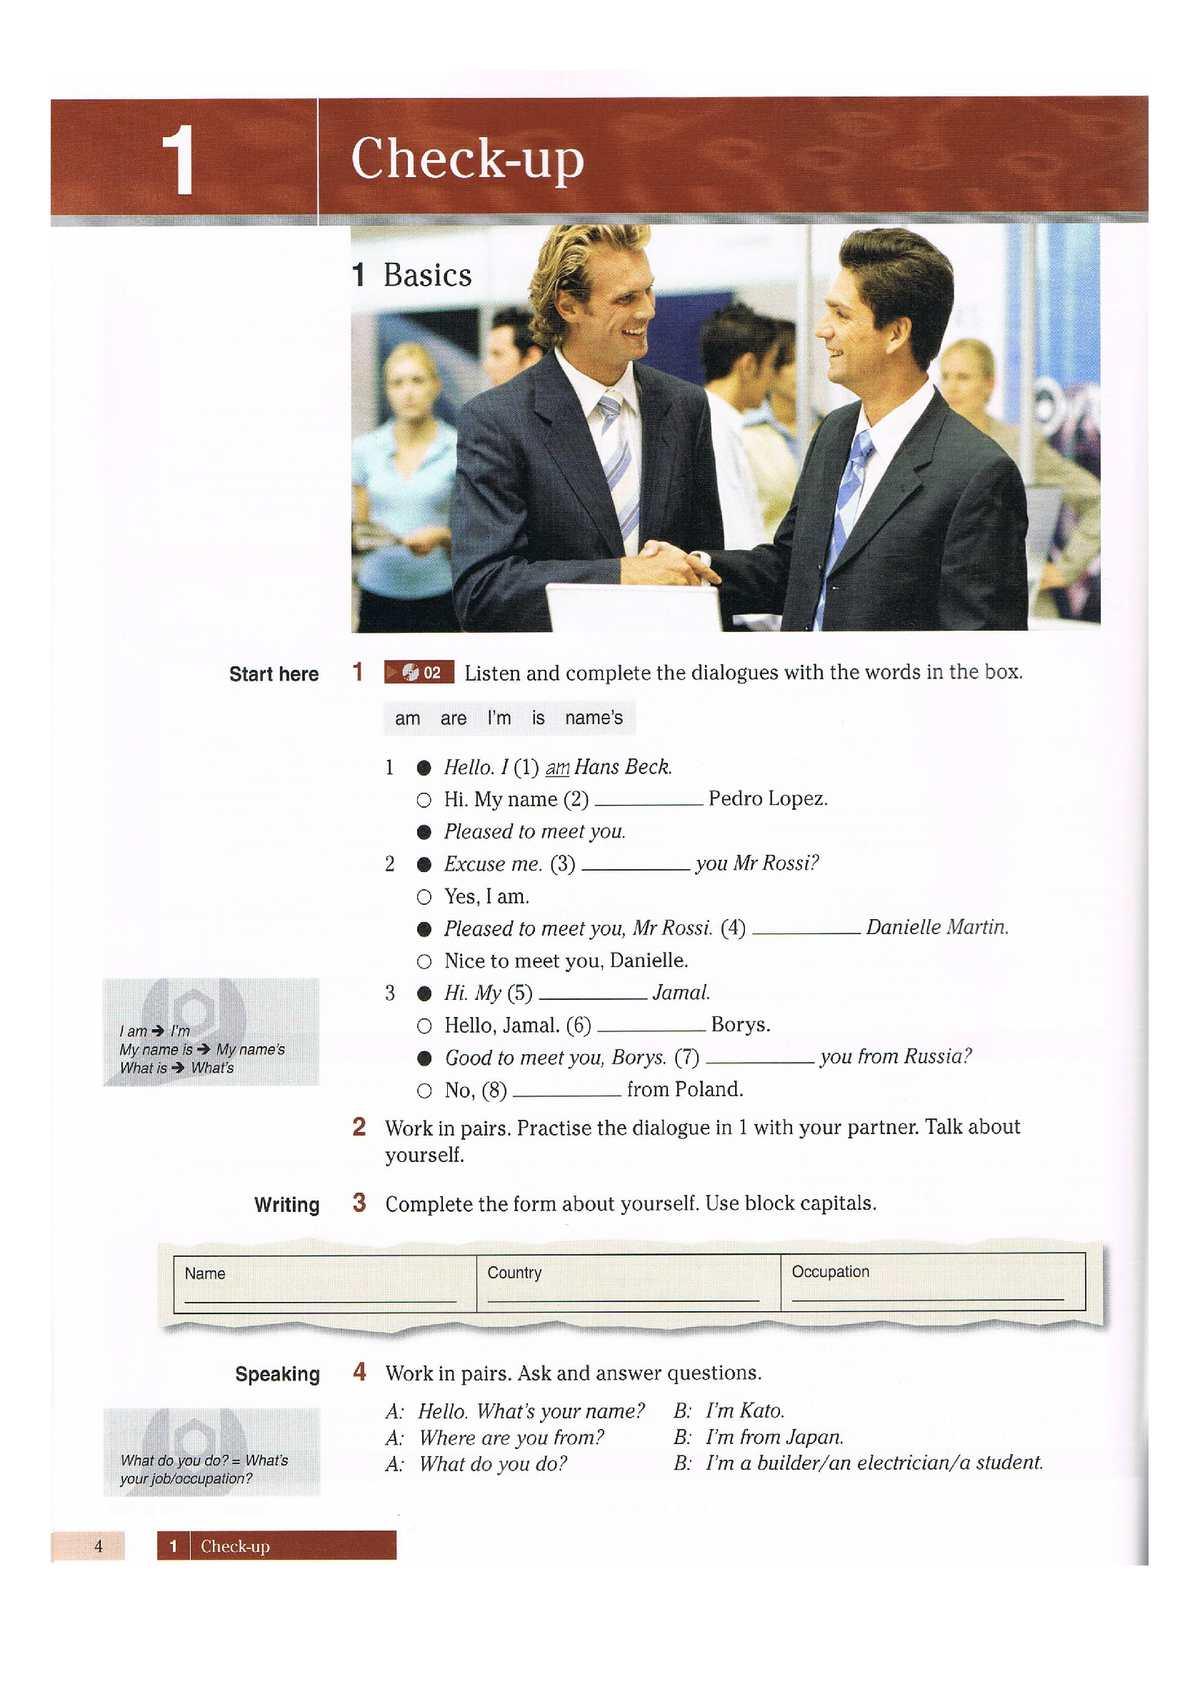 تحميل كتاب technical english 1